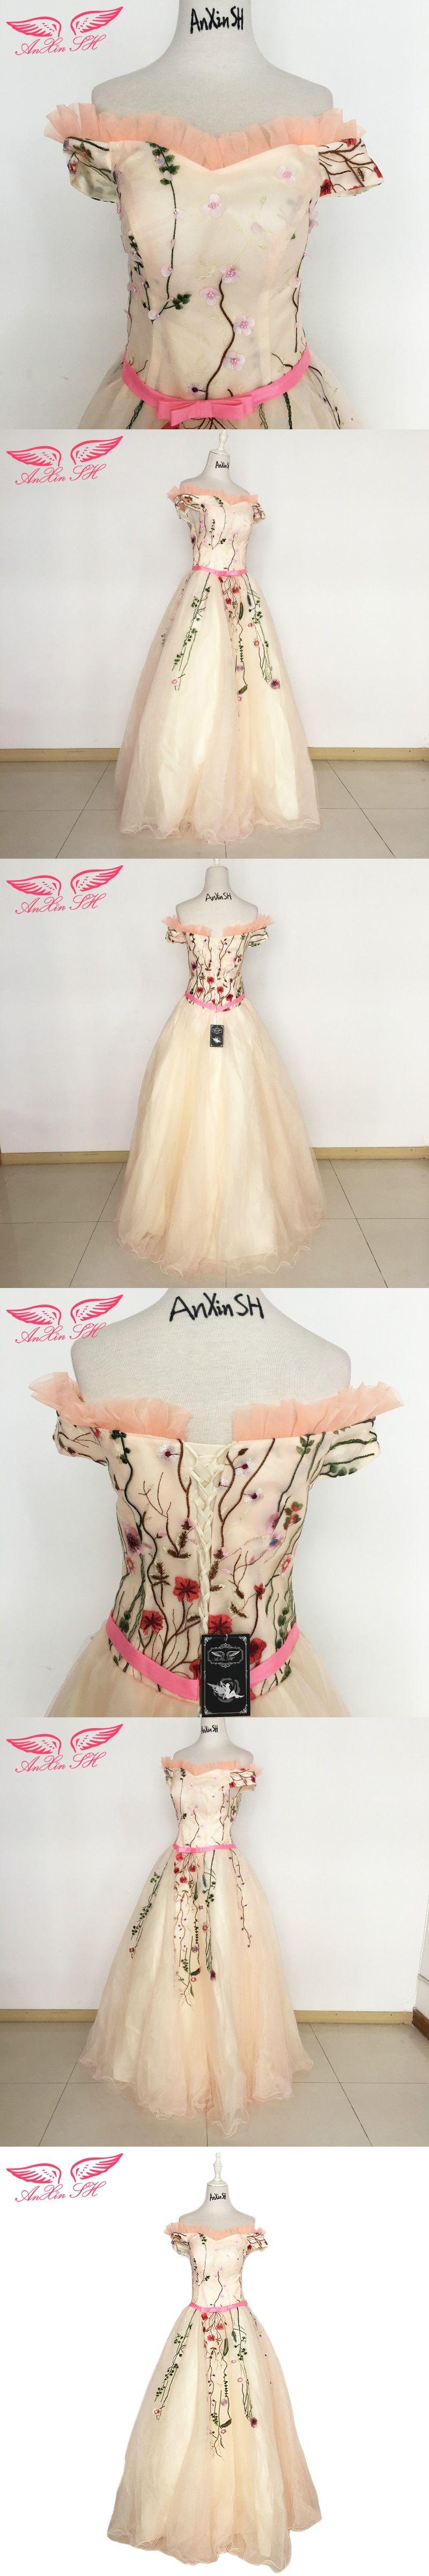 Anxin sh pink flower lace evening dress ruffles boat neck turkey